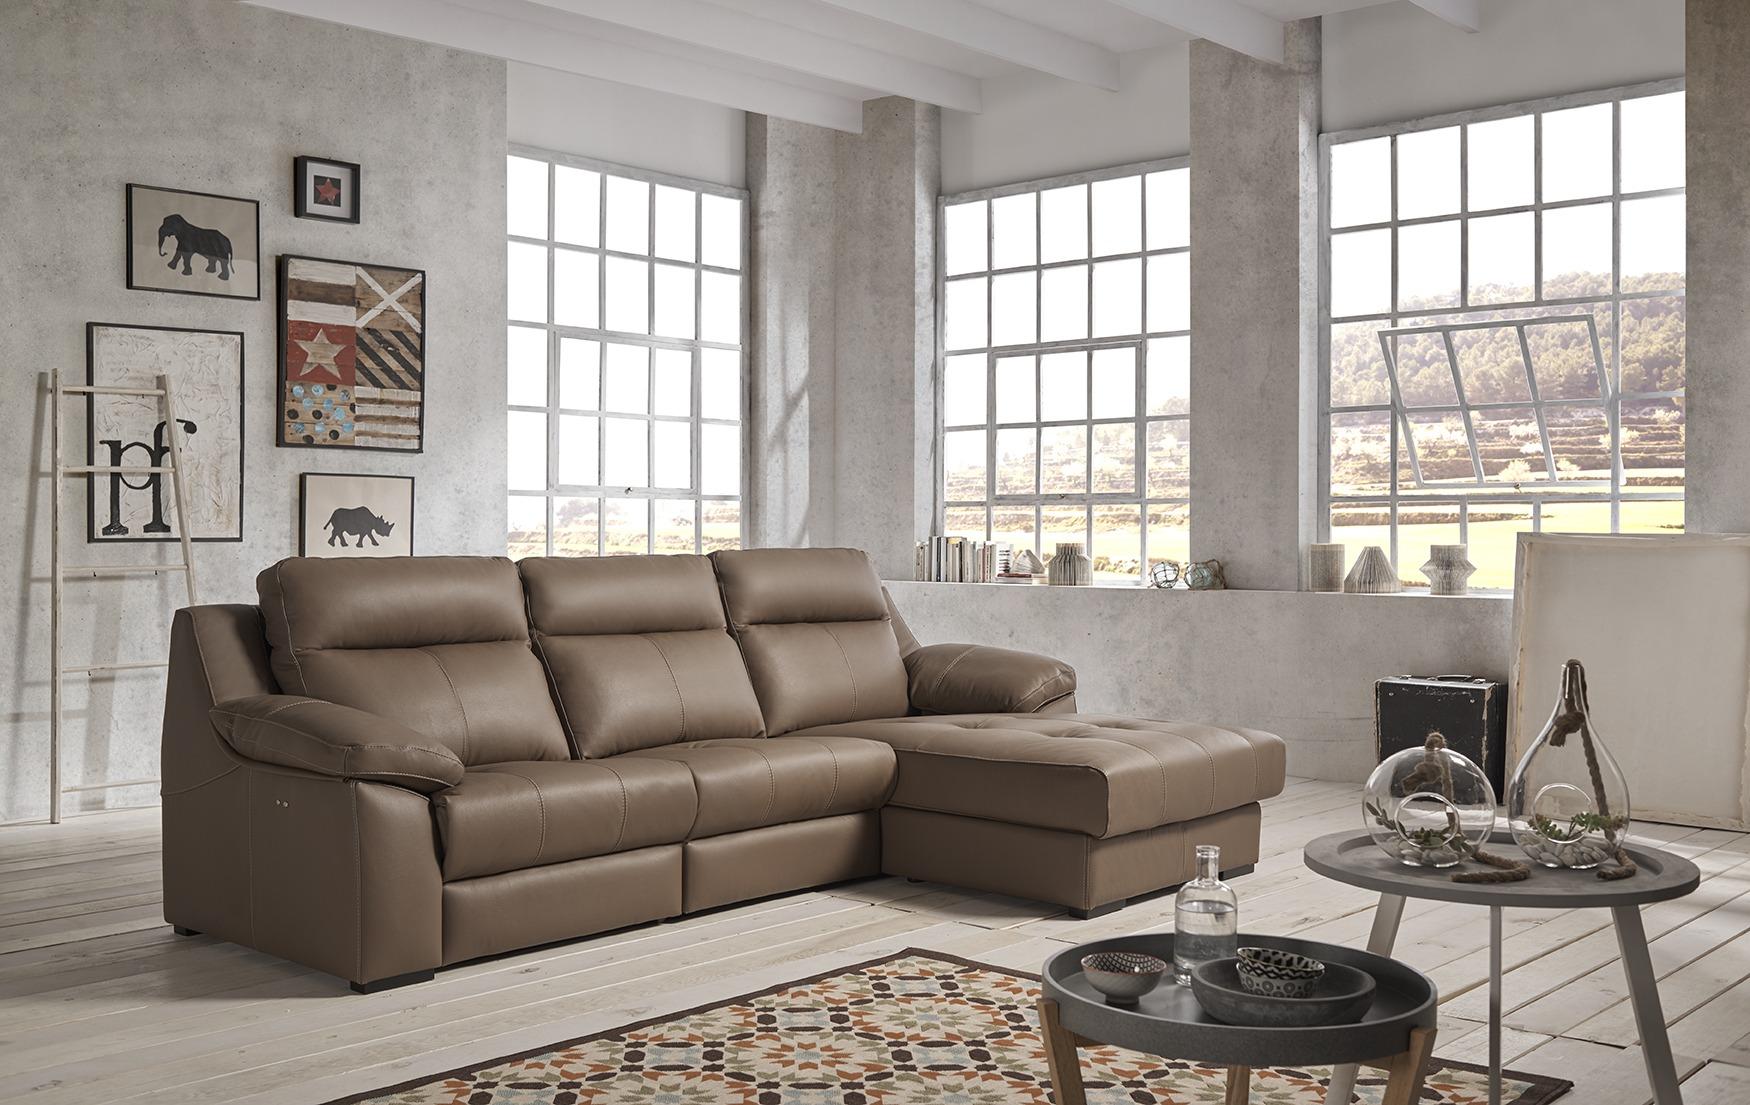 sofas-modernos-General-muebles-paco-caballero-1801-5cdfe89321caa